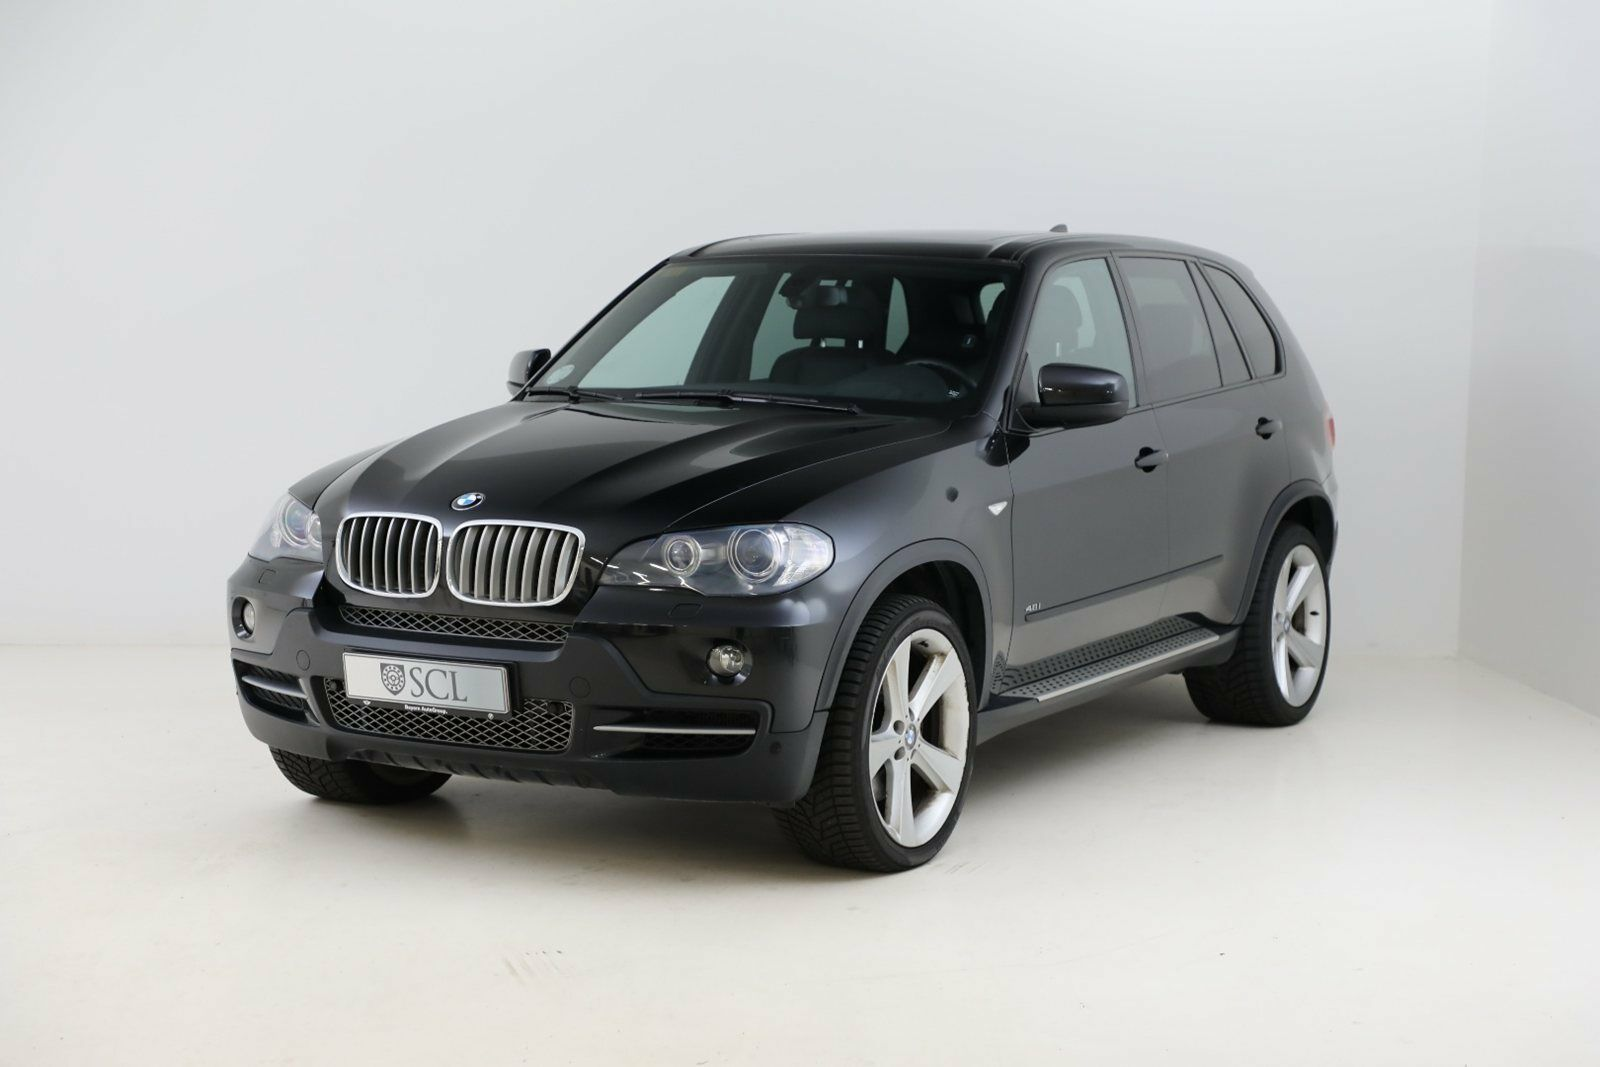 BMW X5 4,8 xDrive48i aut. 7prs 5d - 399.900 kr.